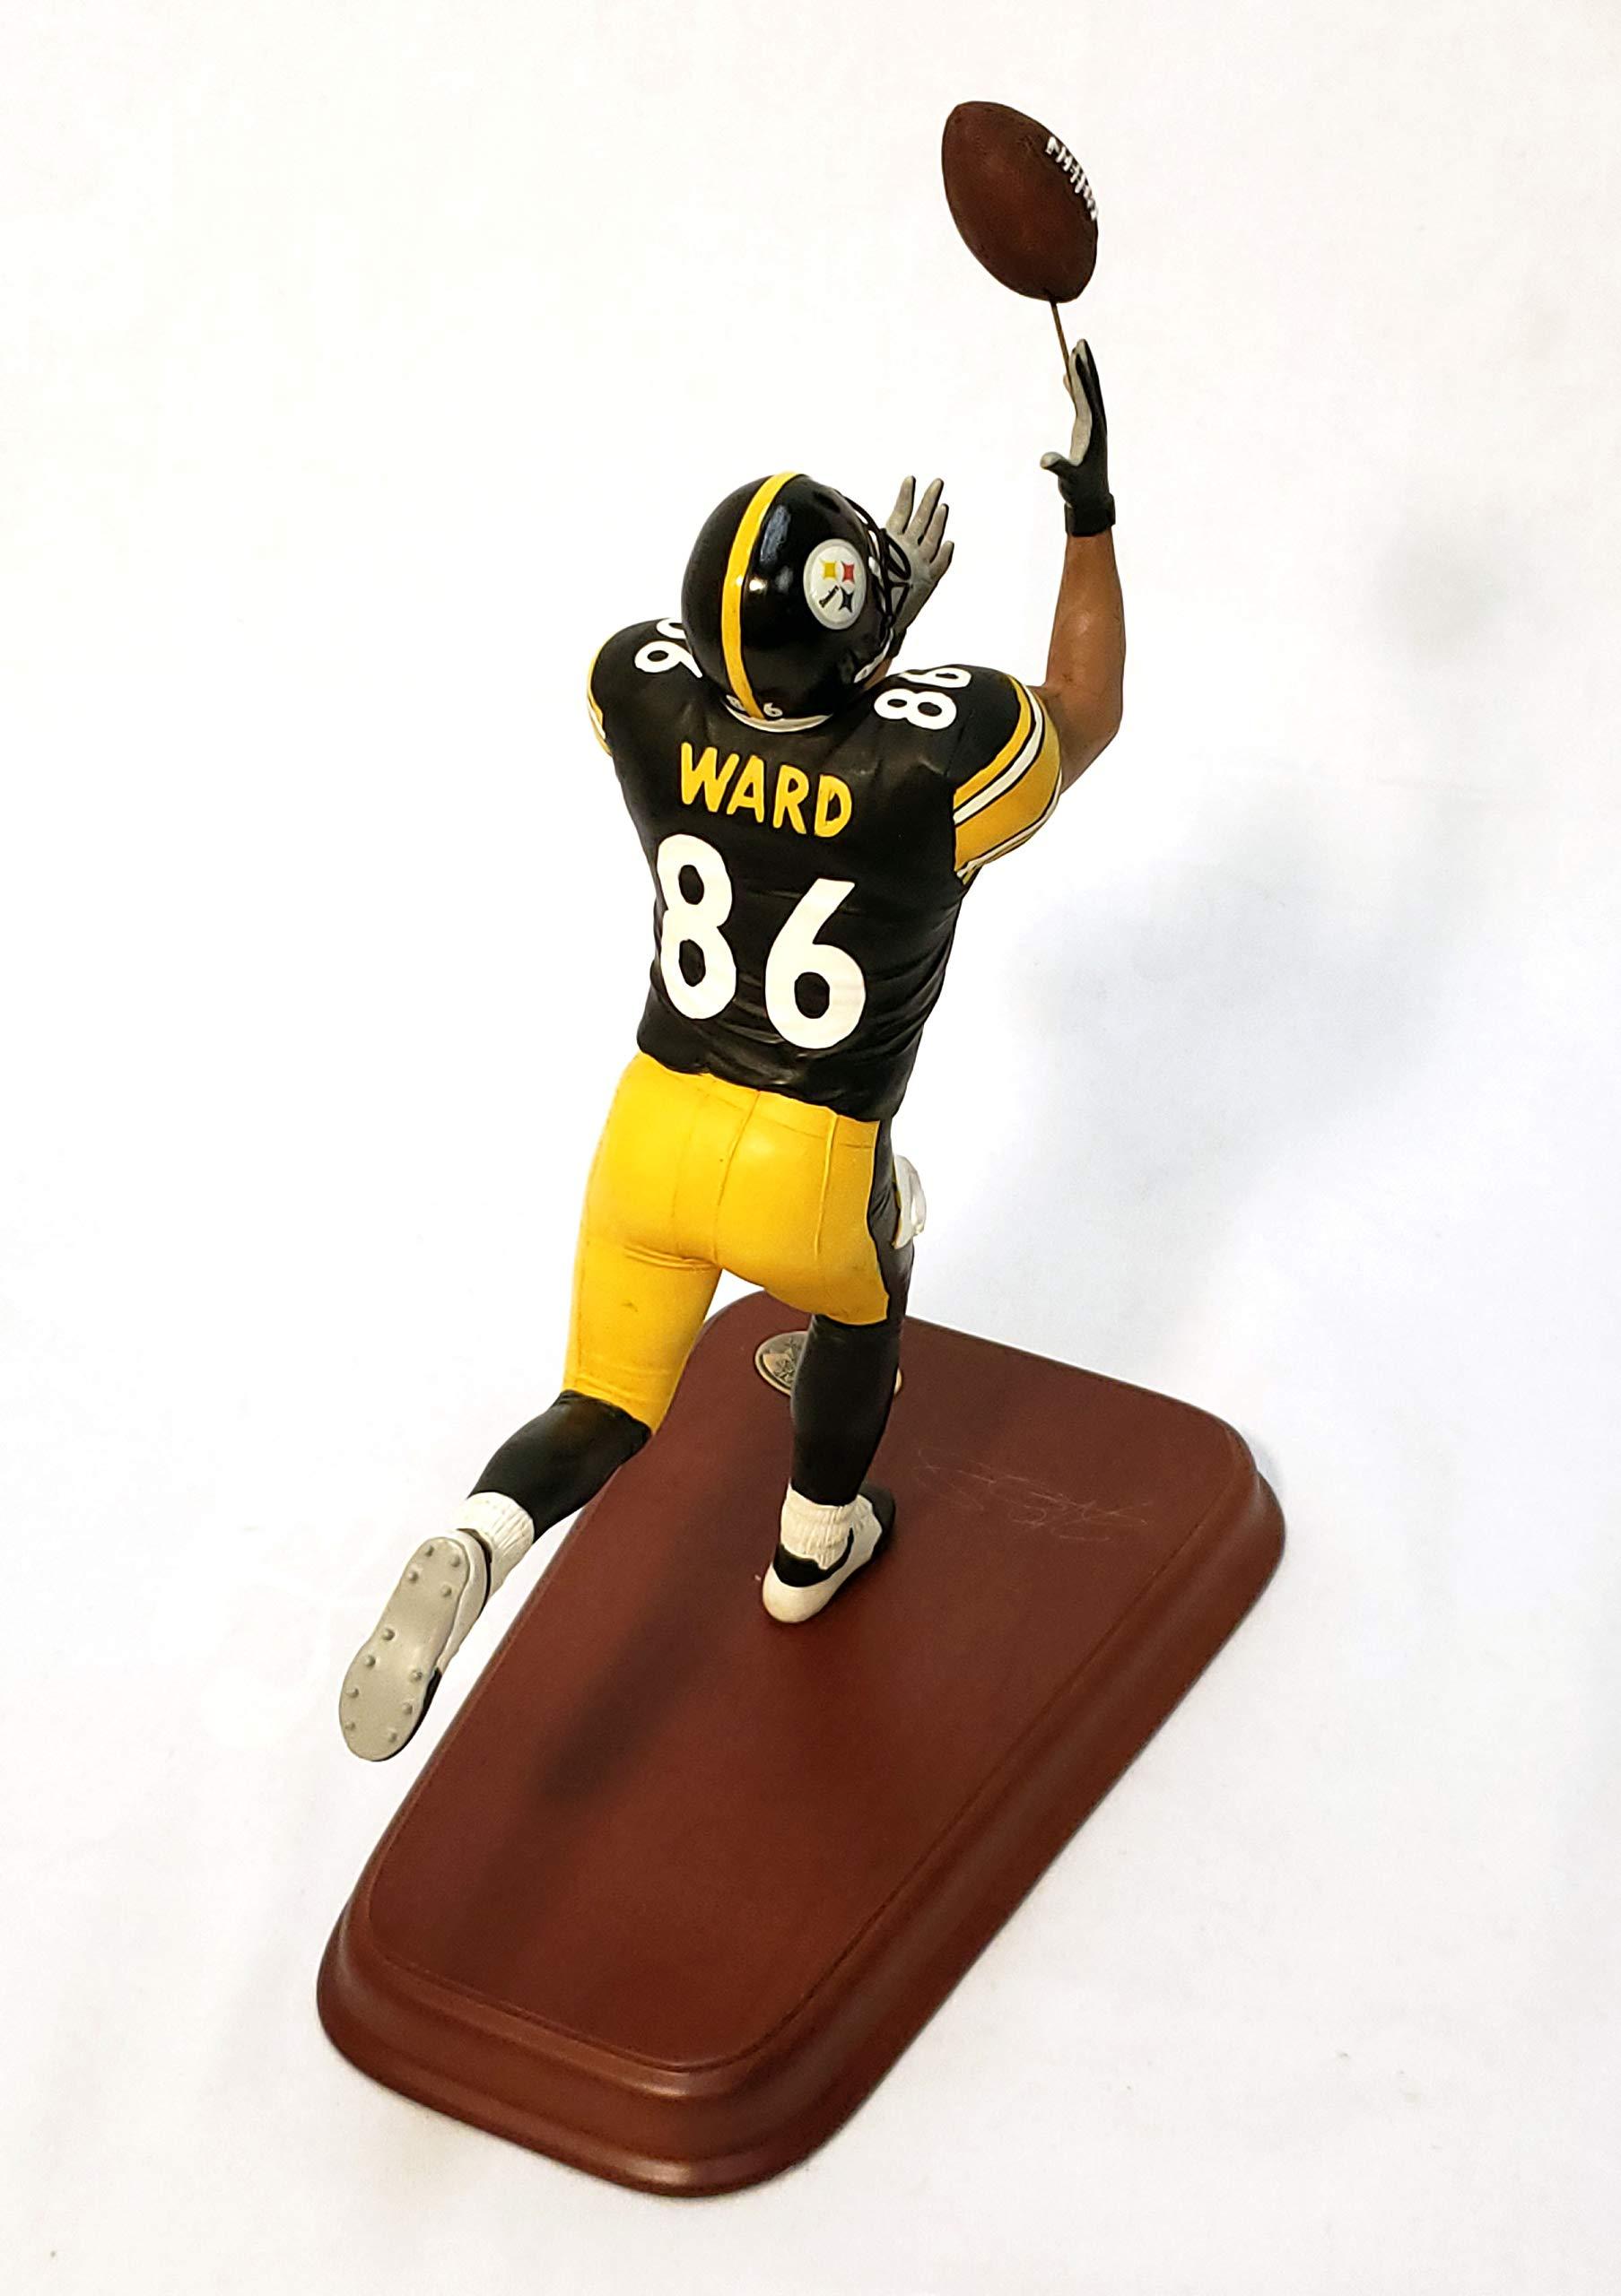 Pittsburgh Steelers Hines Ward Danbury Mint Statue Figurine w/COA